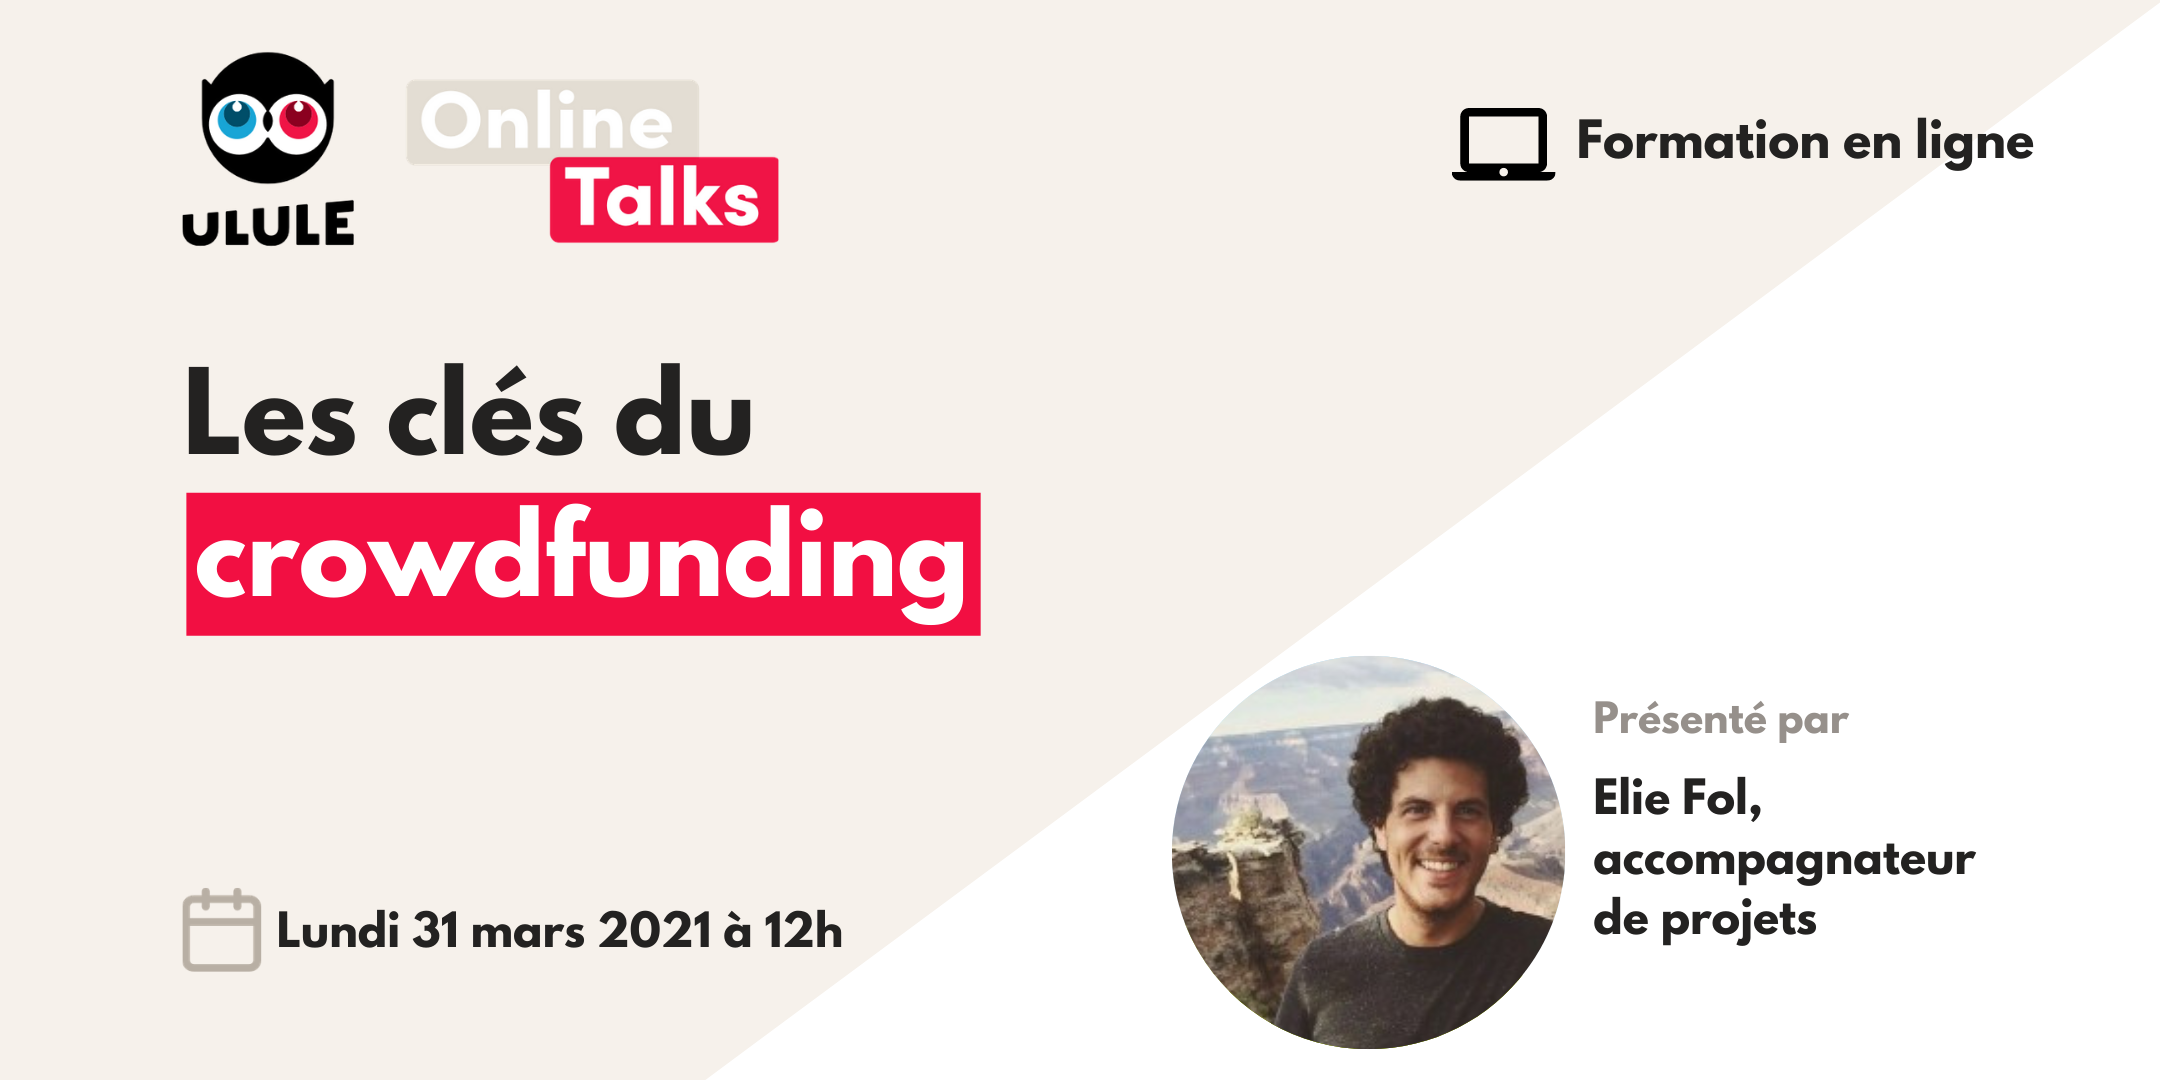 Webinaire crowdfunding - Mercredi 31 mars à 12h